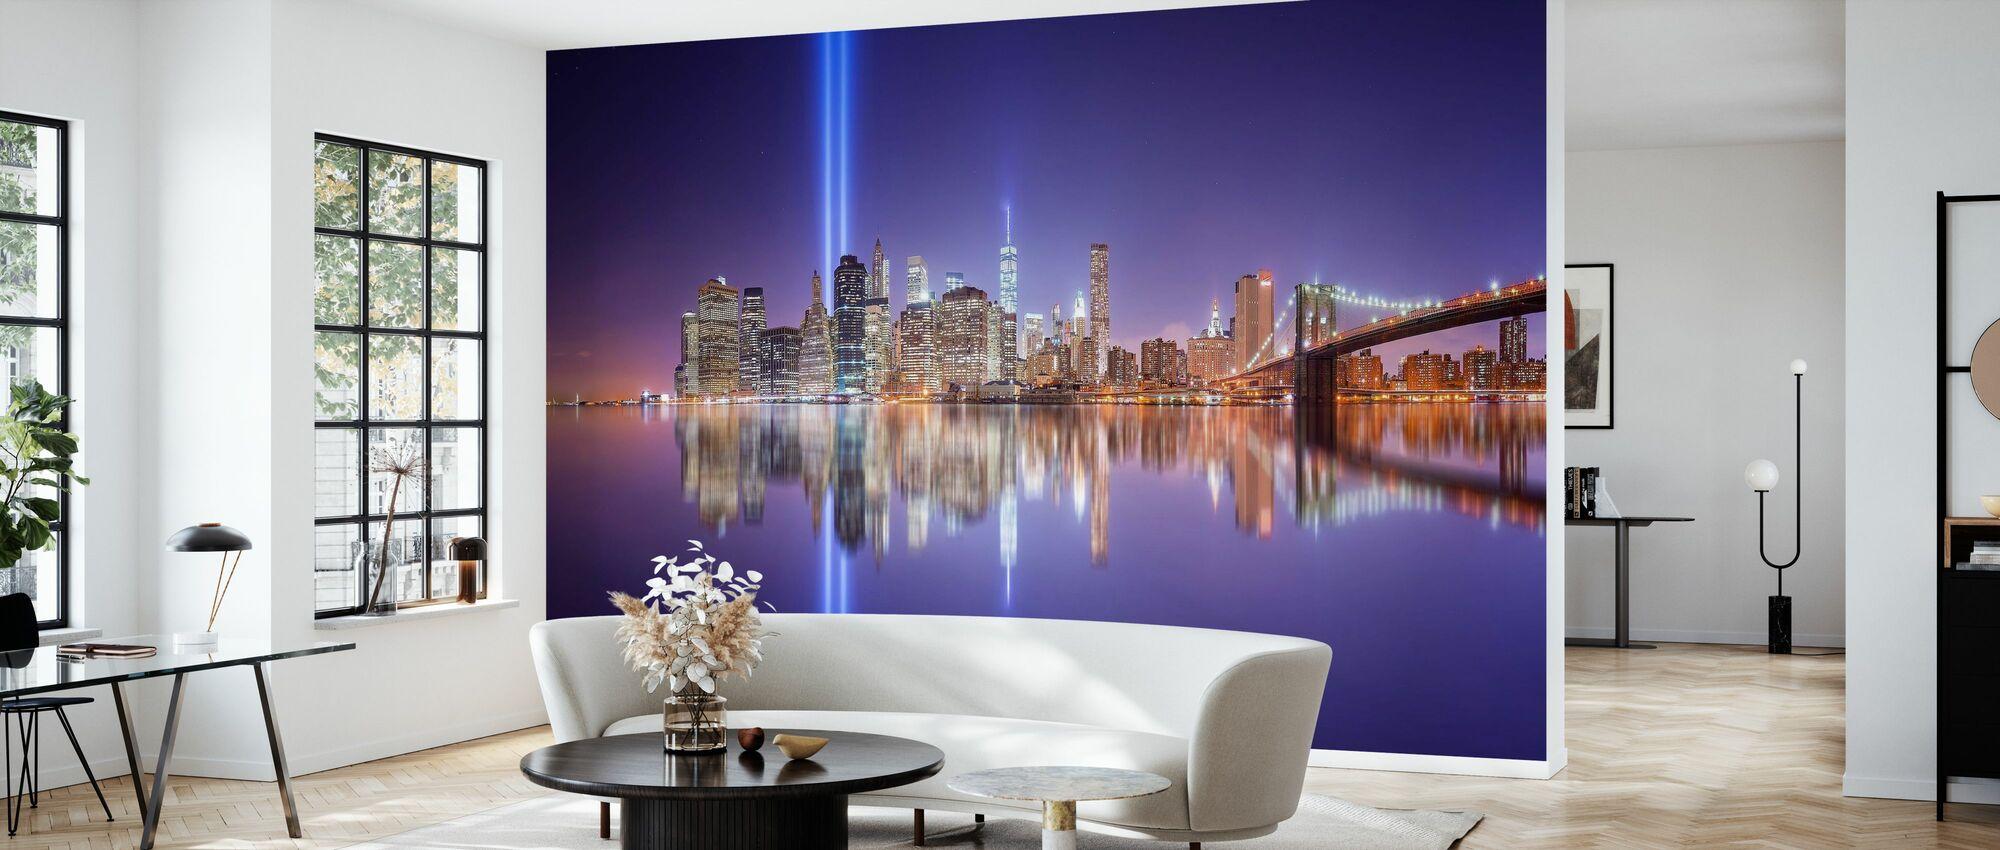 In Memorial - Wallpaper - Living Room